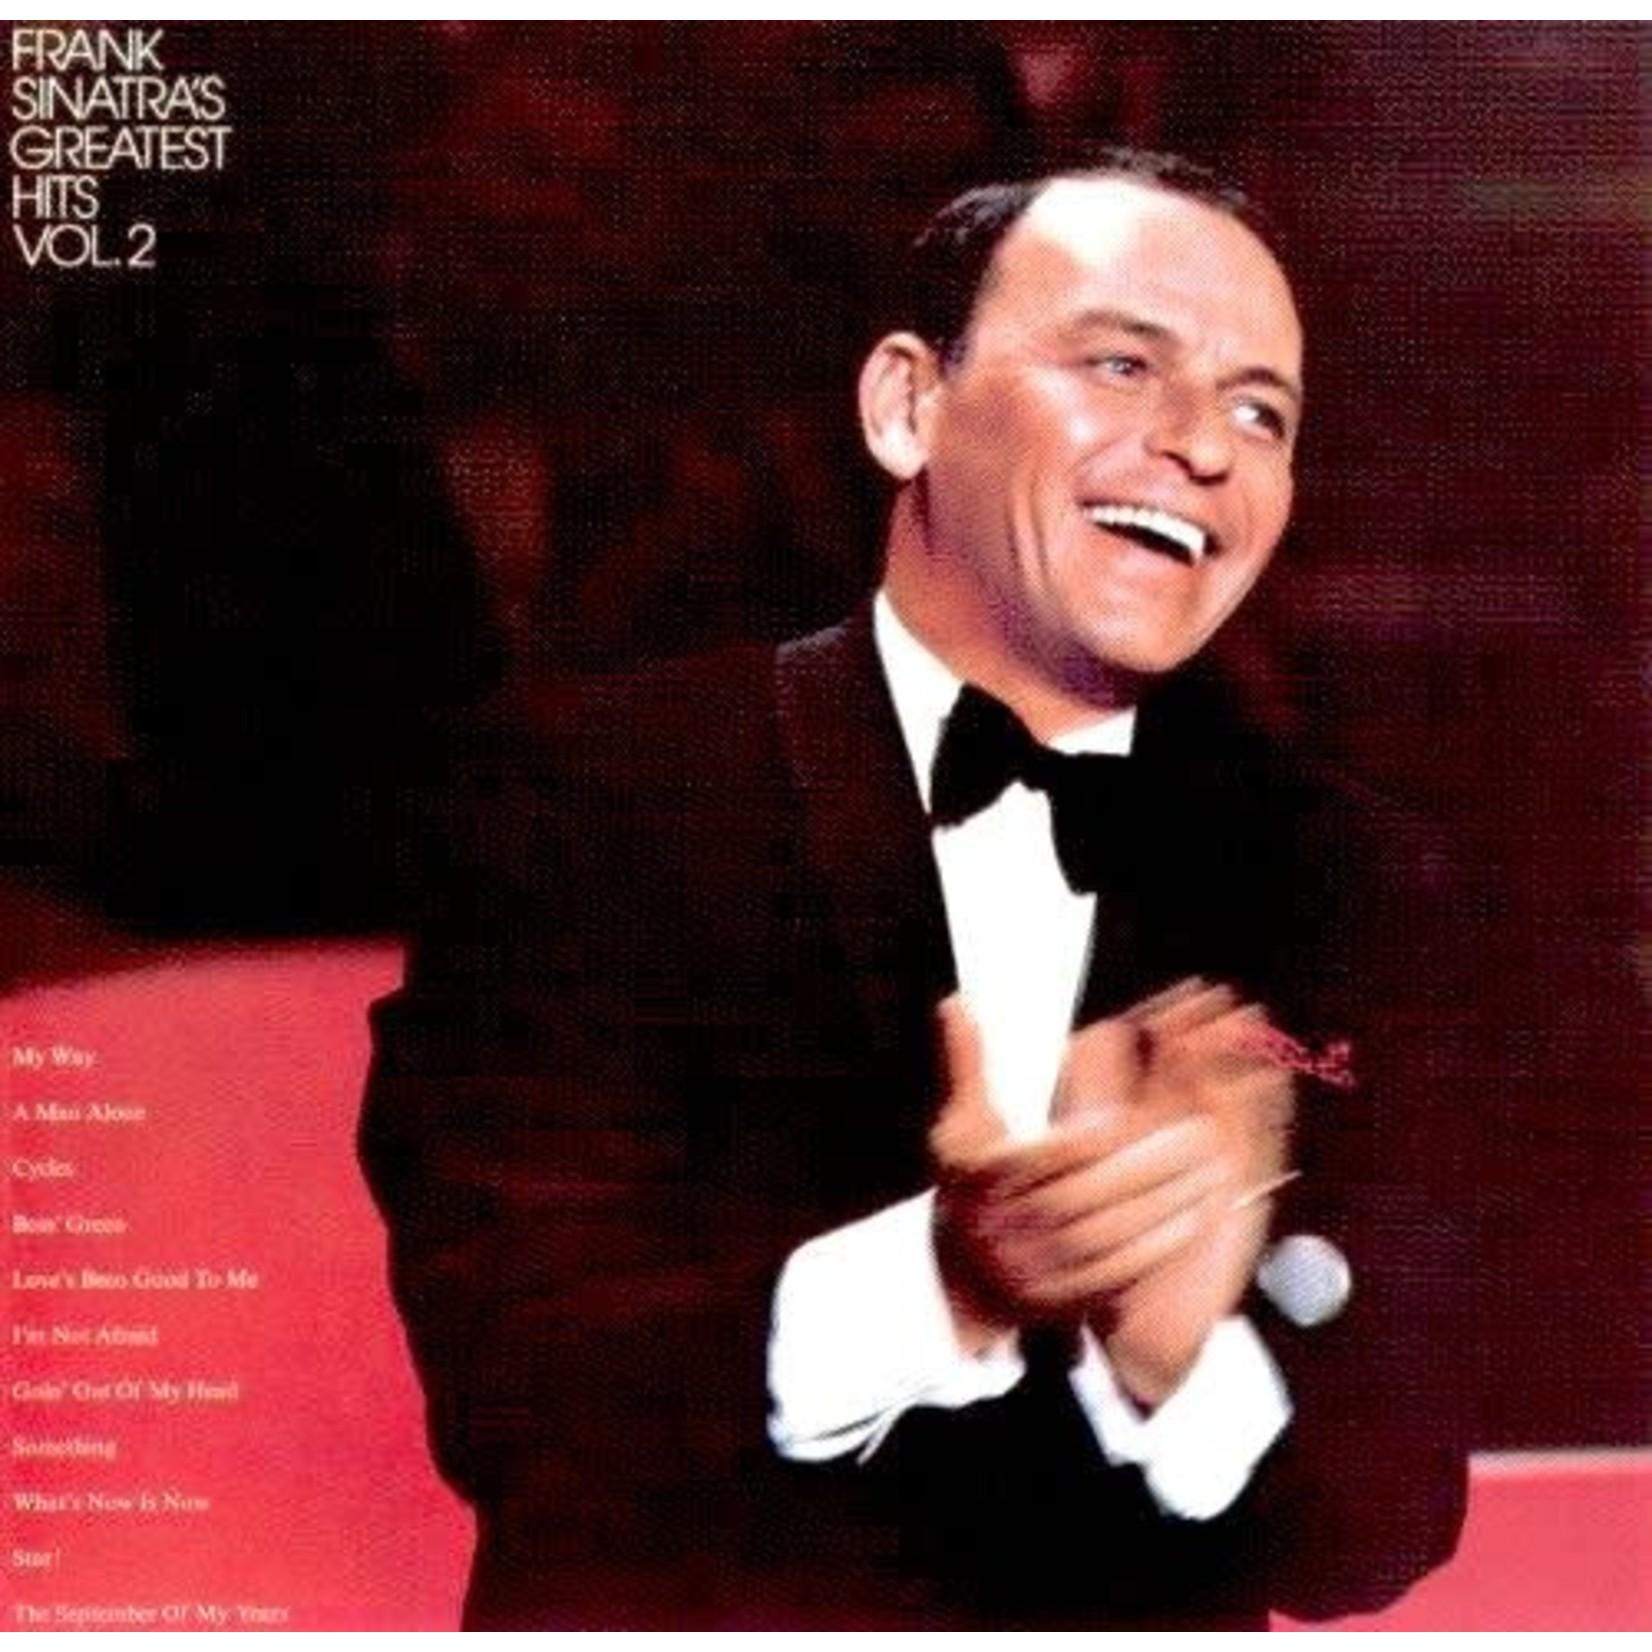 [Vintage] Sinatra, Frank: Greatest Hits Vol. 2